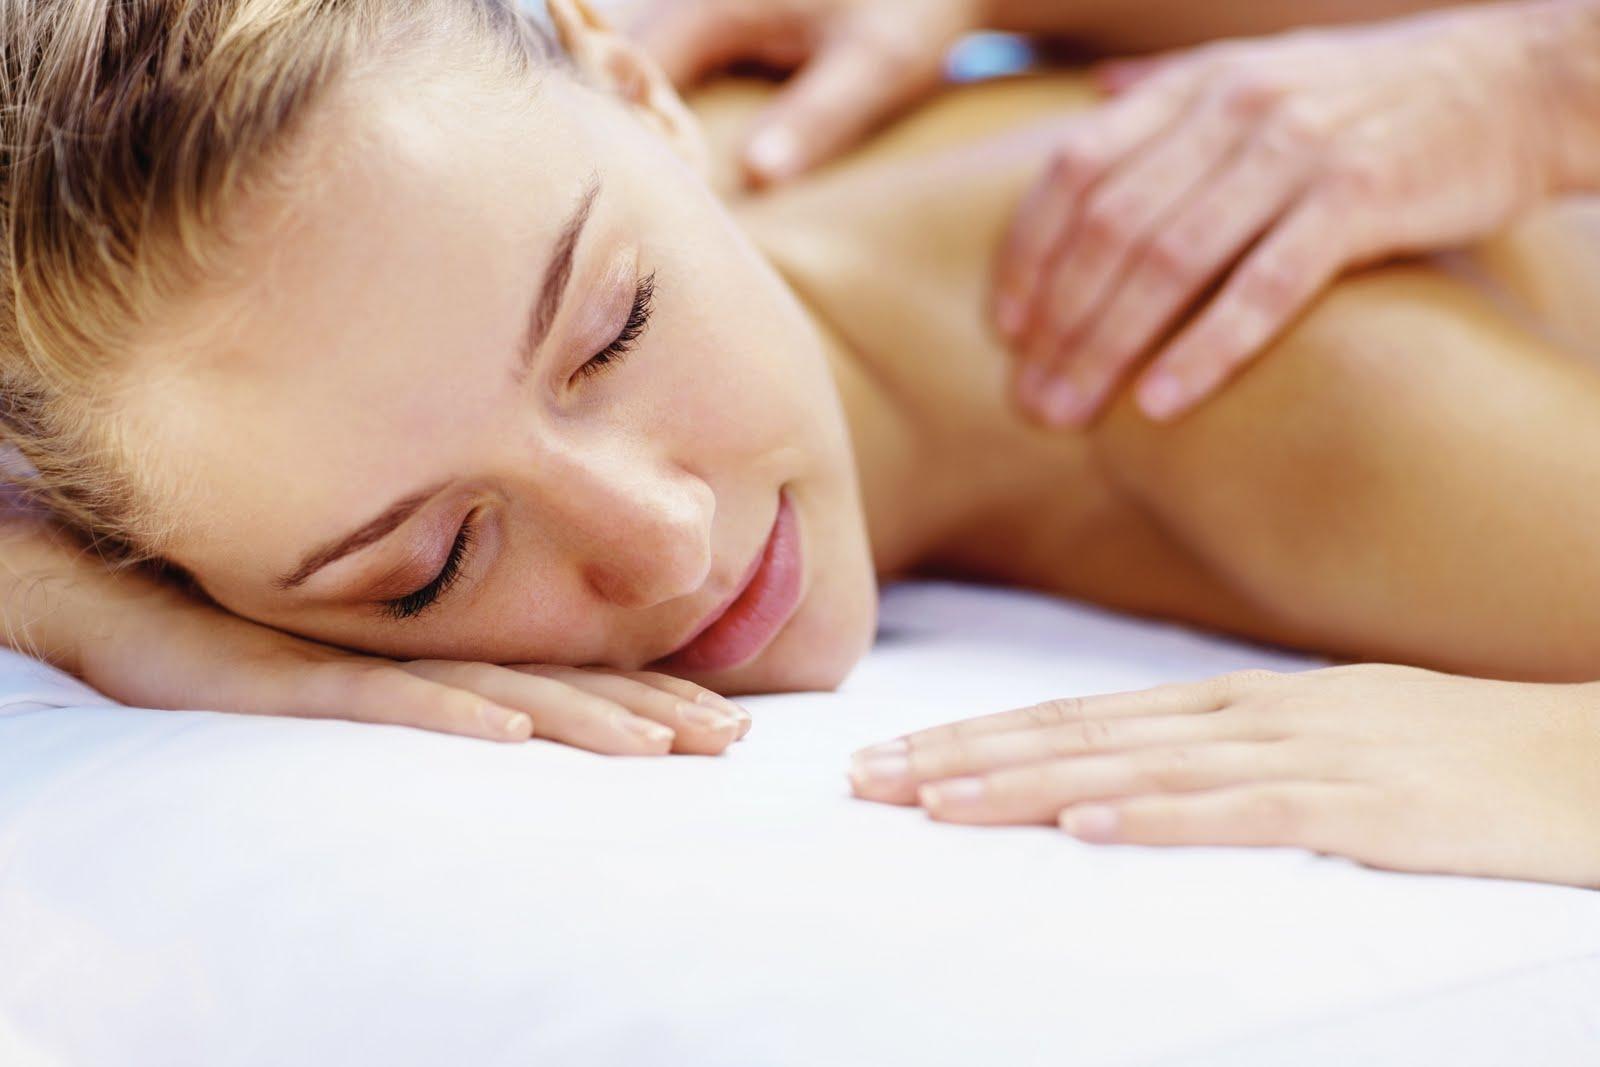 sport massage stockholm dejtsidor gratis